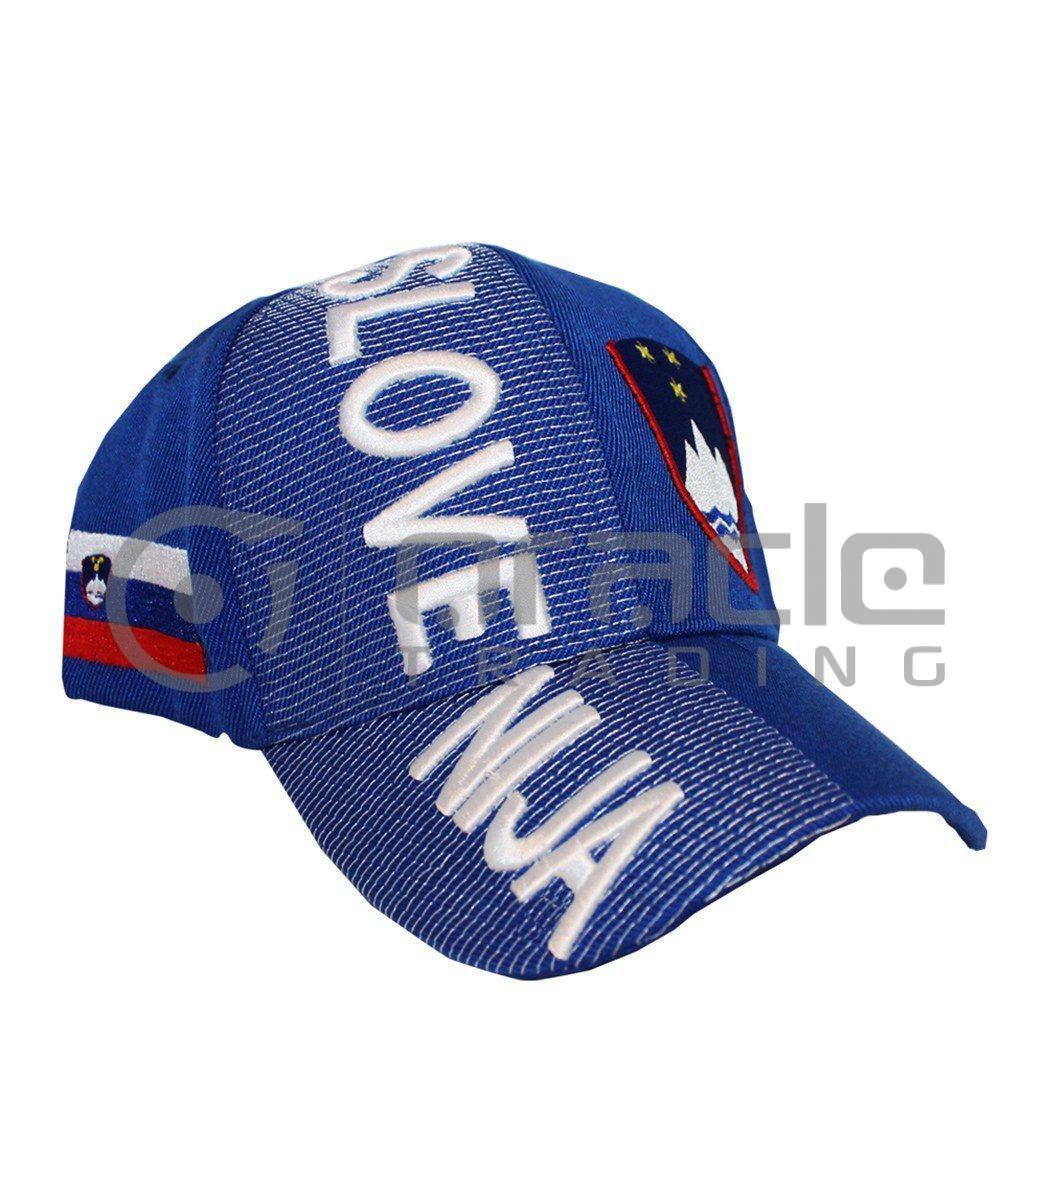 3D Slovenia Hat